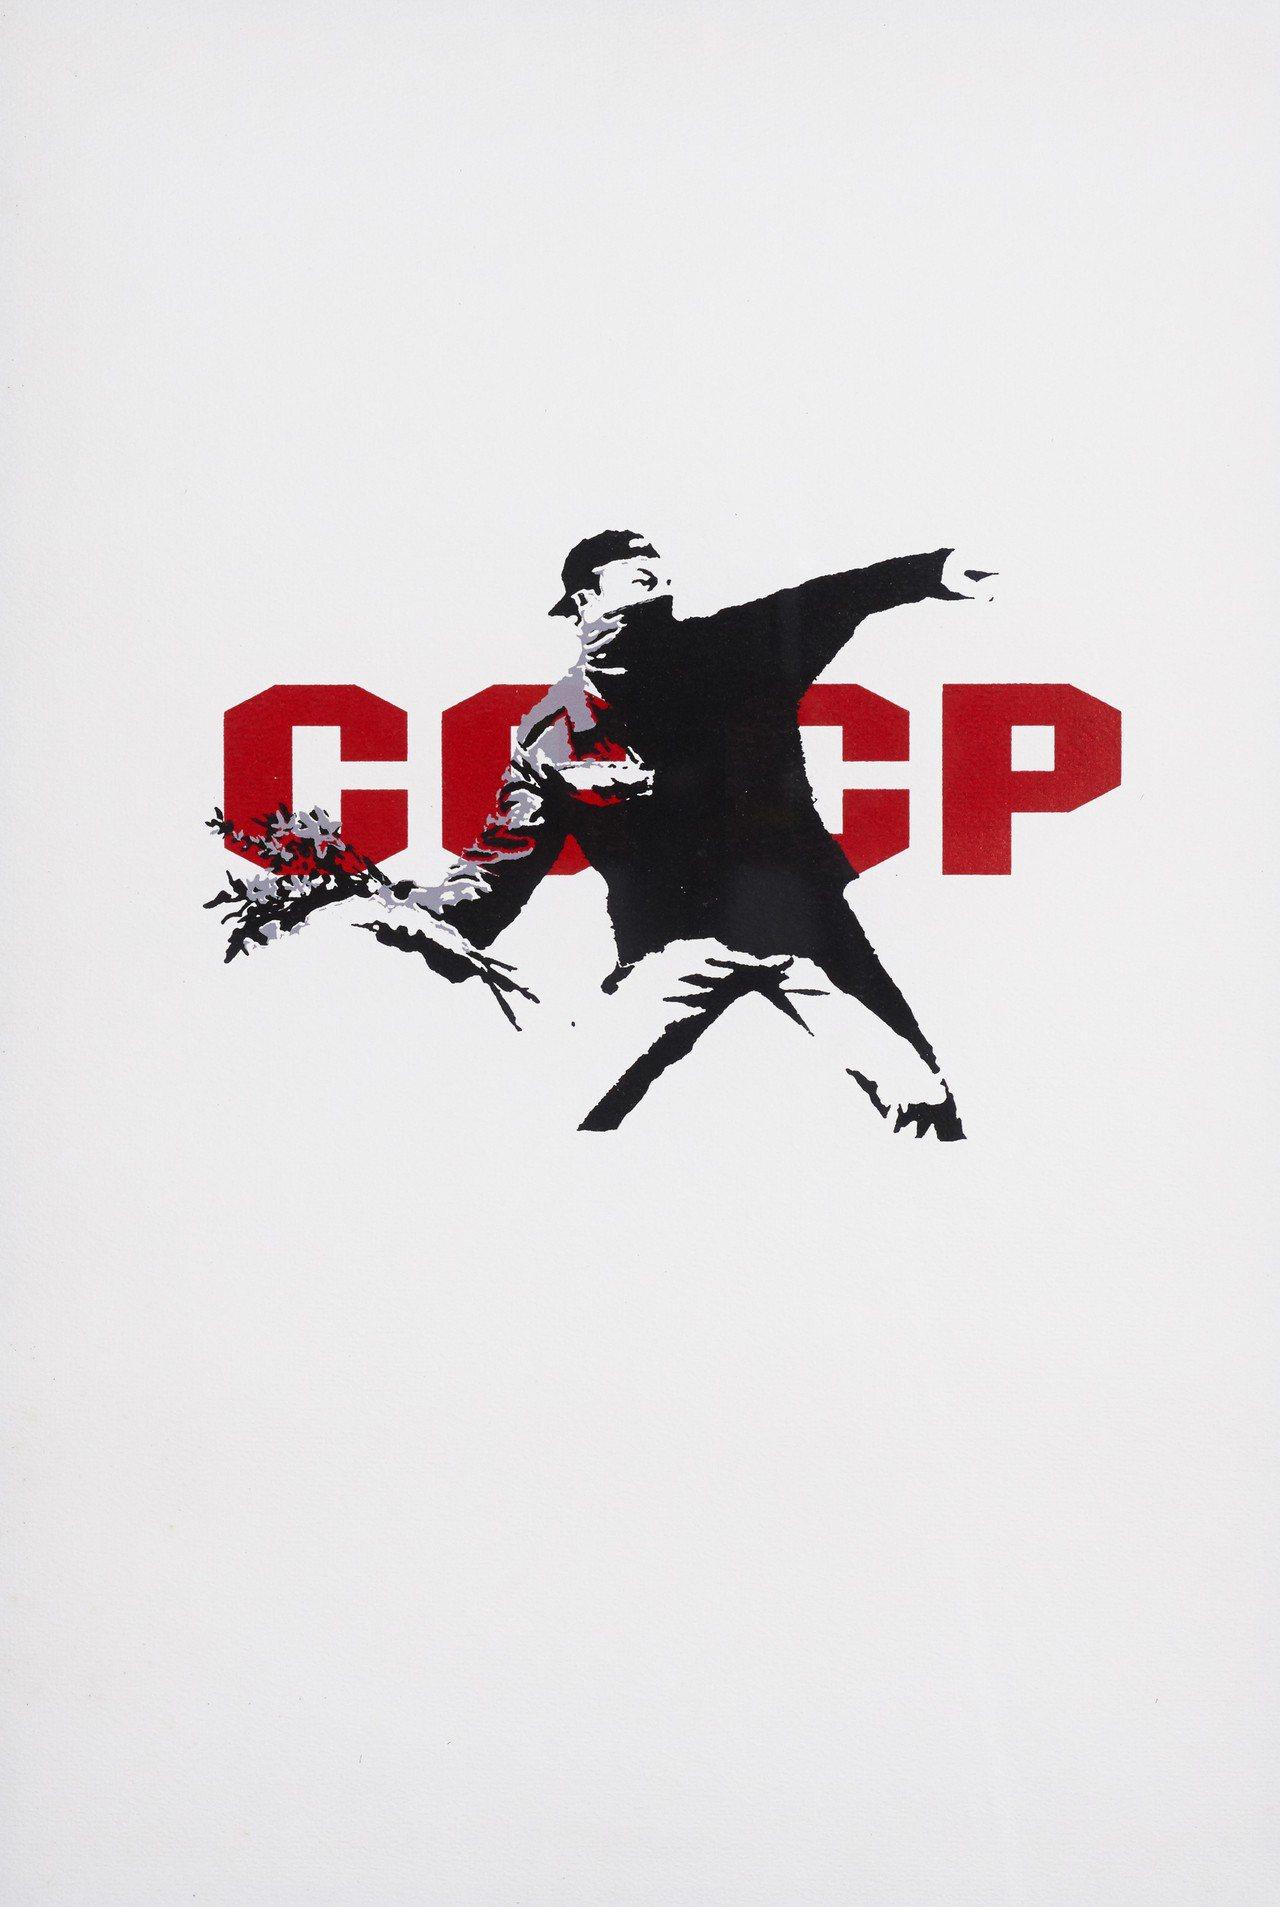 Banksy作品《CCCP (Flower Thrower)》, 2003年作品...